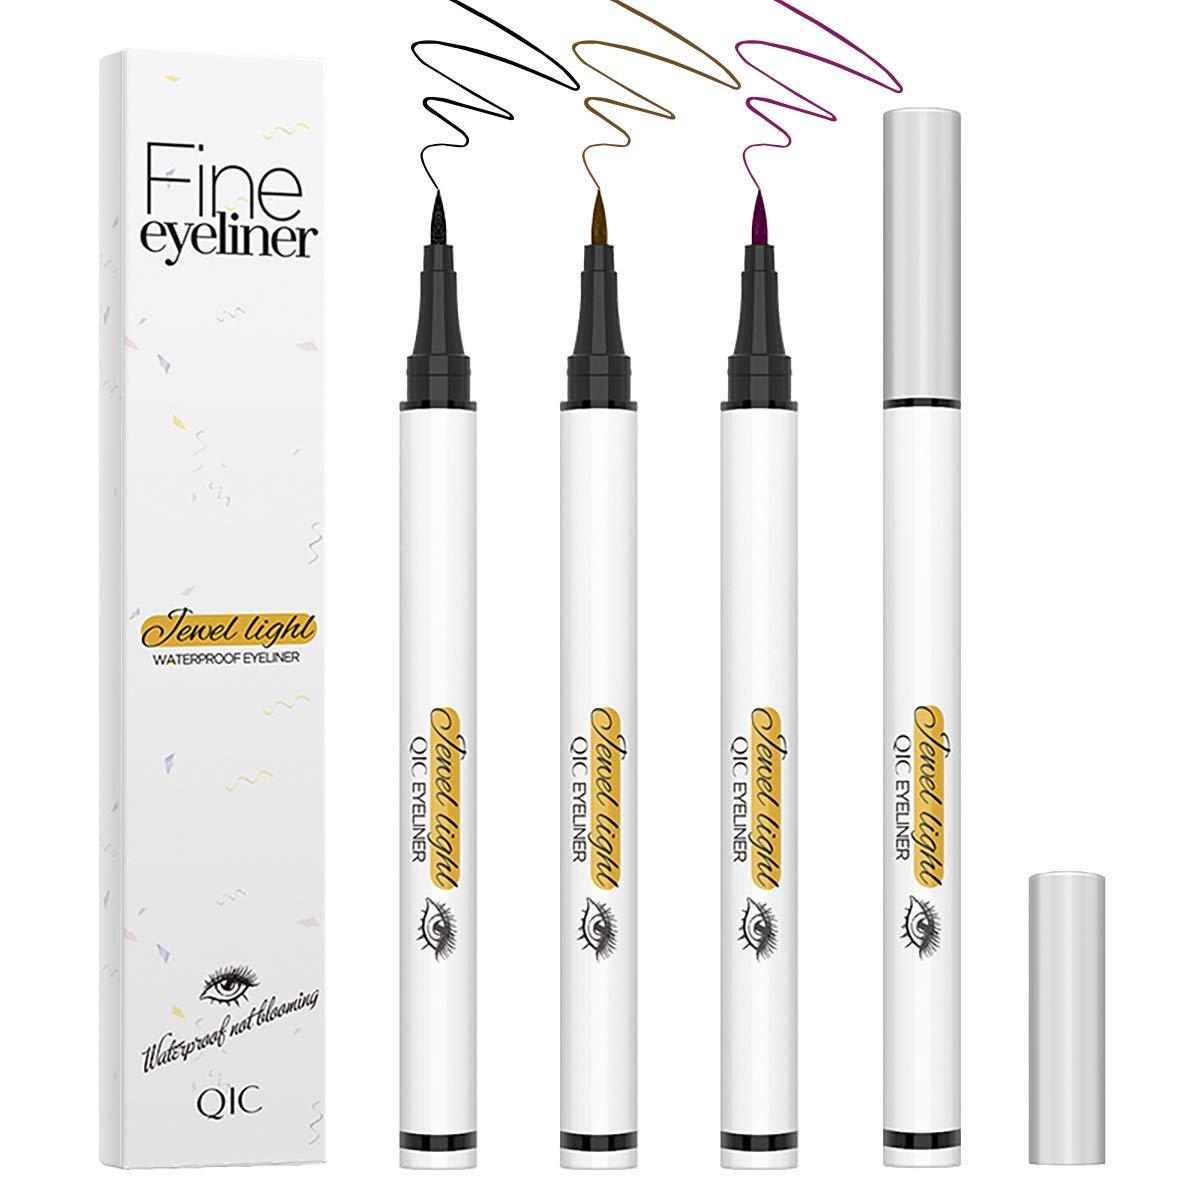 3PCS Liquid Eyeliner Pen,Tailpa Waterproof Proof Hypoallergenic Eyeliner,Long Lasting&Smudgeproof Neon Slim Eyeliners,Colored Flexible Felt Tip Eye Liner,Quick Drying Formula(Black, Brown,Rose Red)